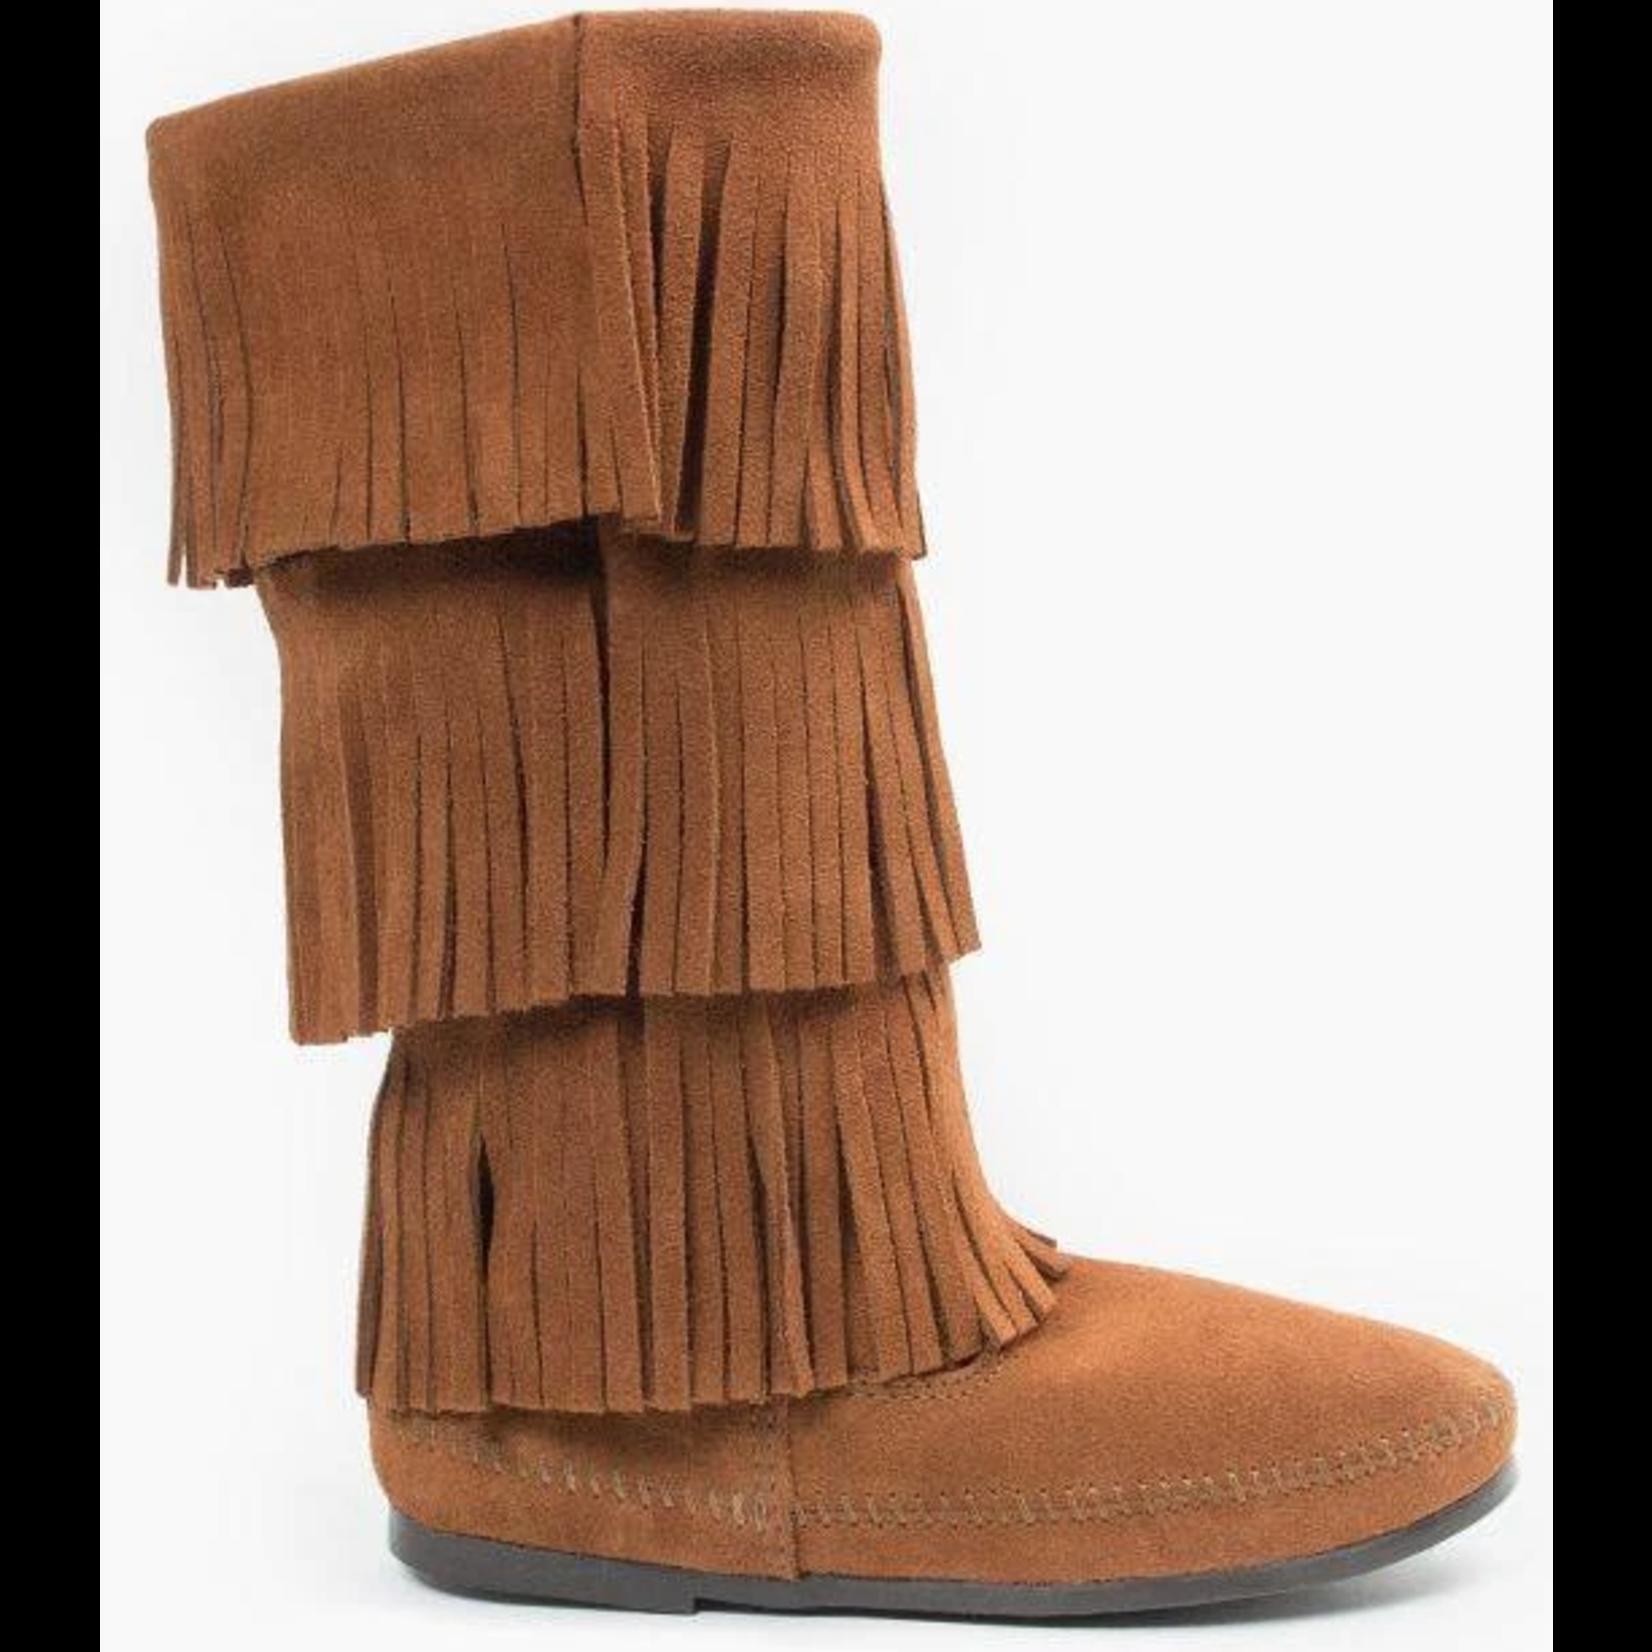 Minnetonka Women's Minnetonka 3 Layer Fringe Boot Brown 1632